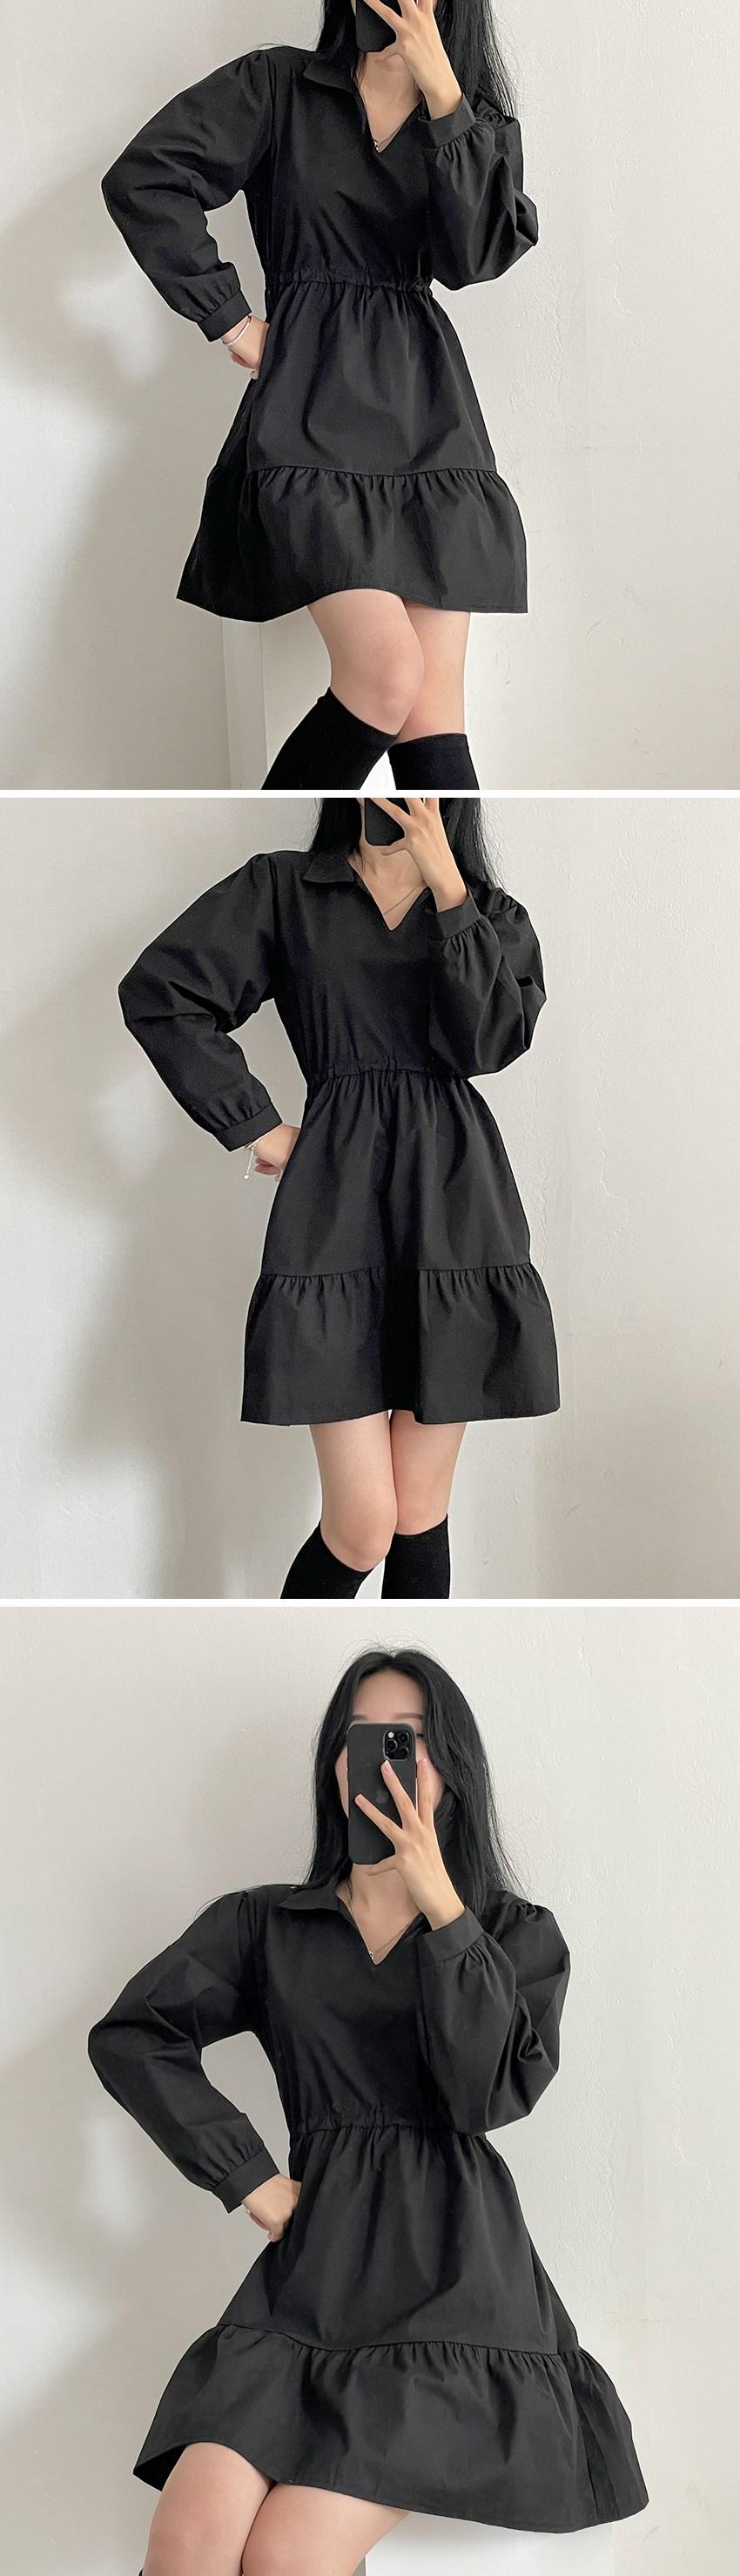 Shirt Collar Backstring Cancan Long Sleeve Mini Dress